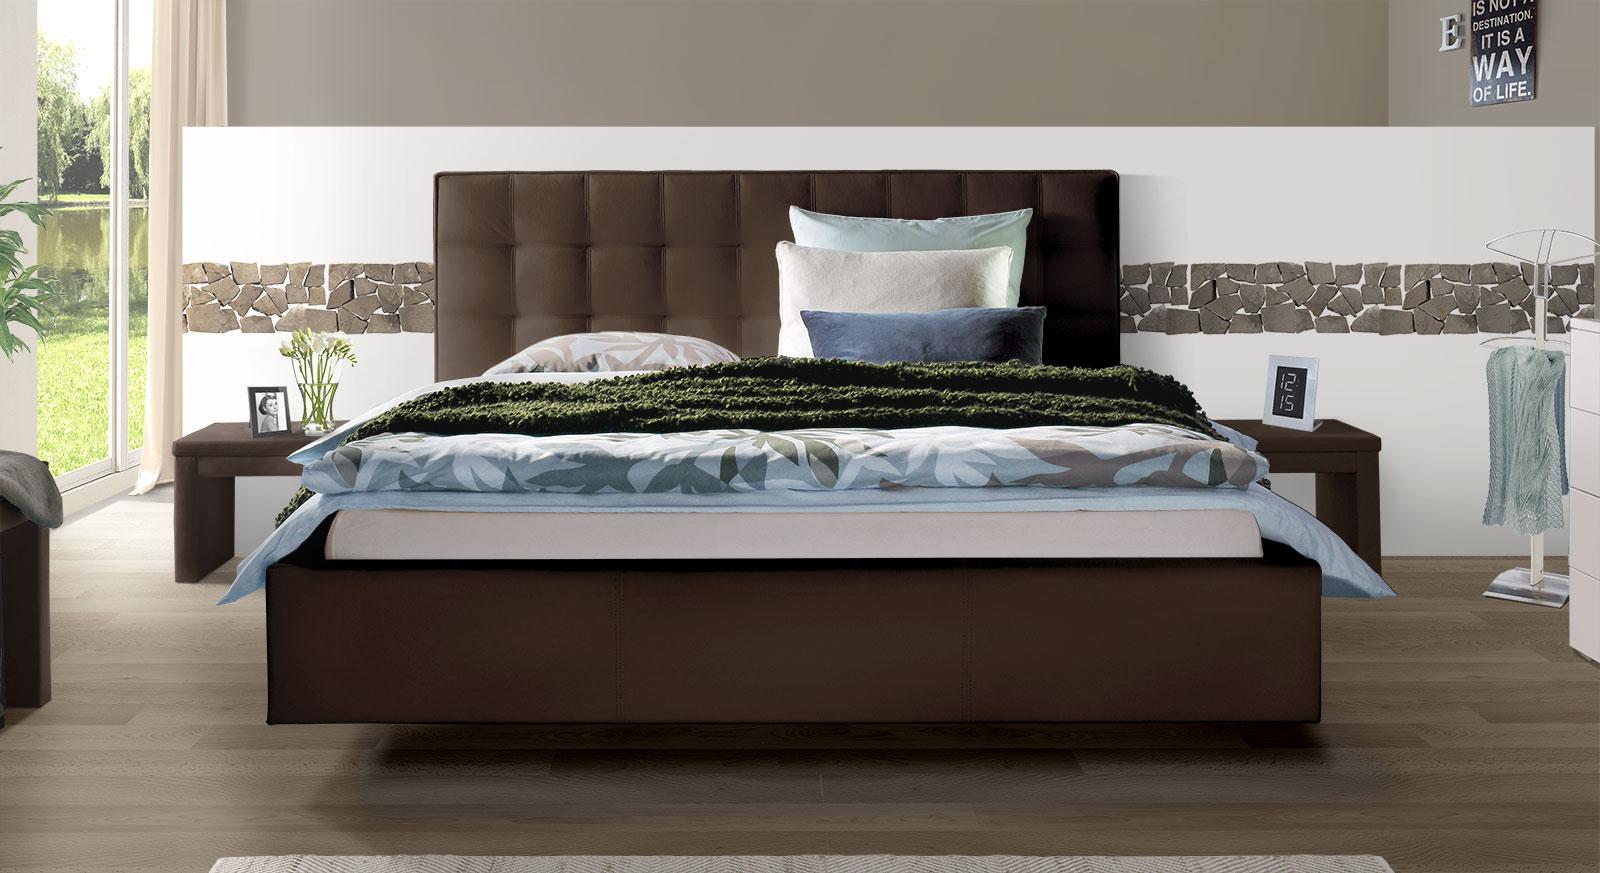 stunning bett mit hohem kopfteil contemporary. Black Bedroom Furniture Sets. Home Design Ideas